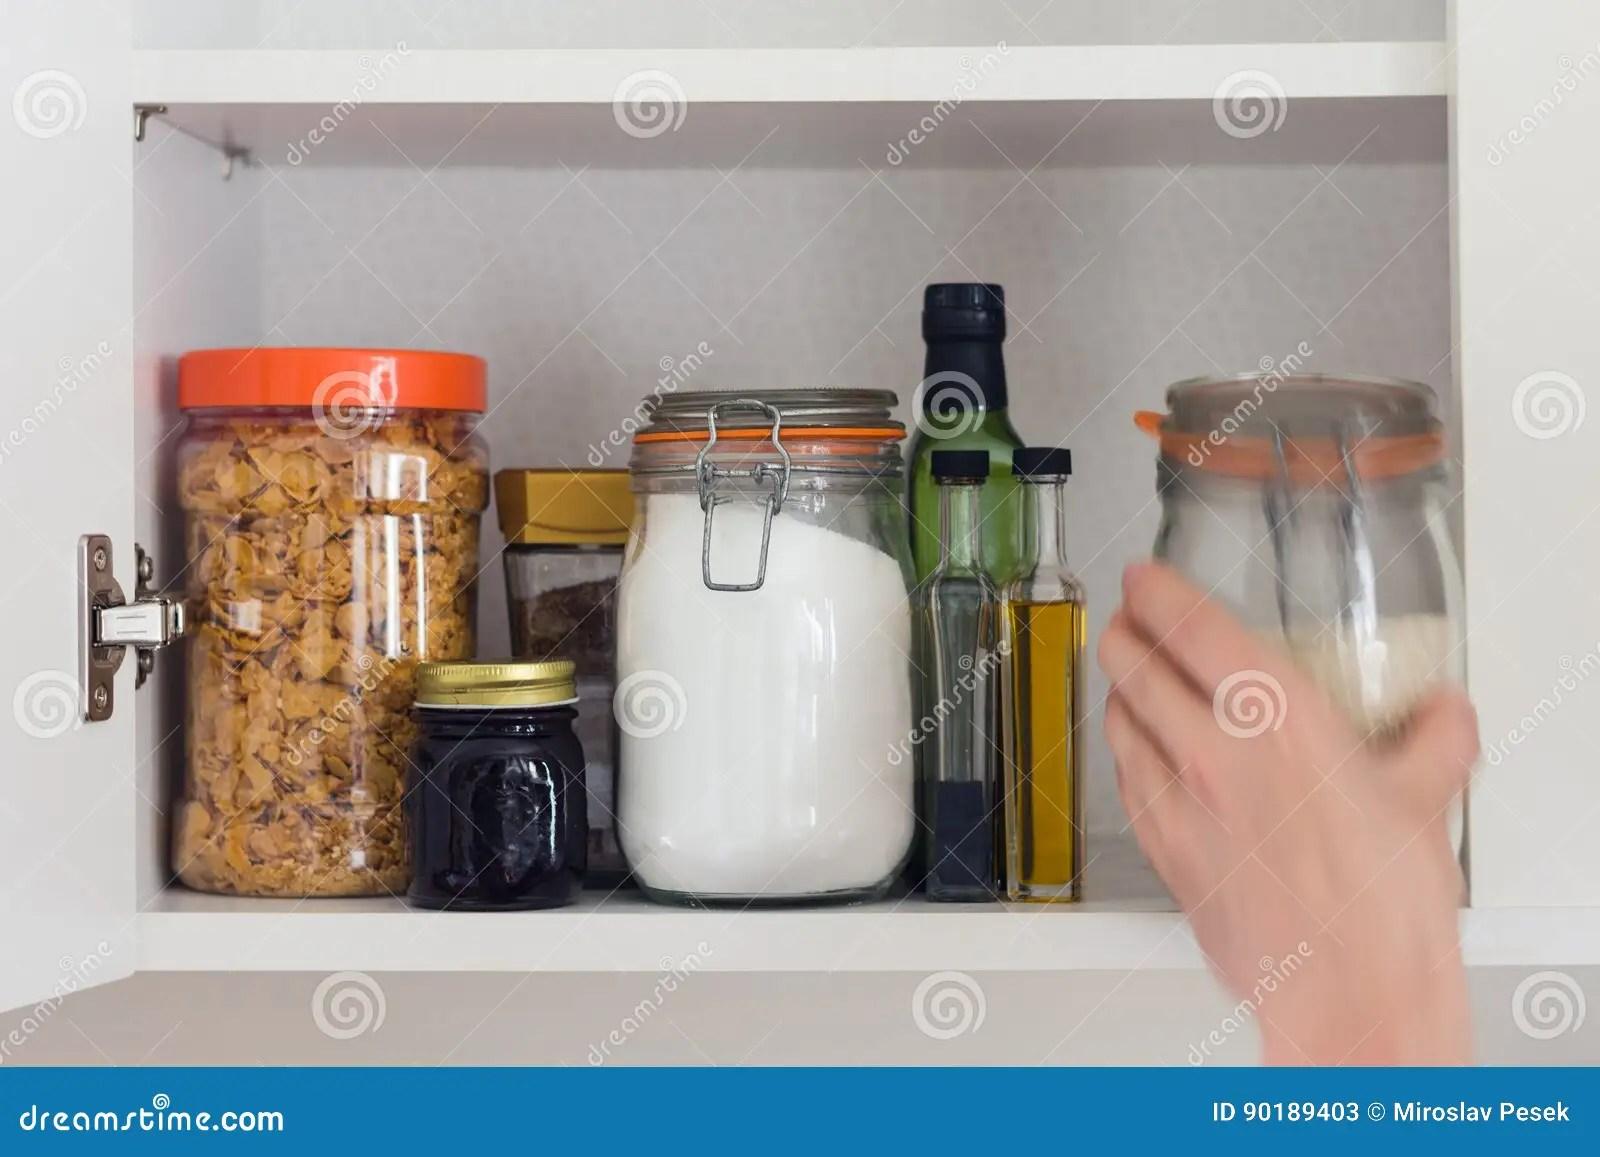 kitchen pantry remodel how to 食物碗柜 有瓶子的餐具室 手库存图片 图片包括有标签 里面 厨房 副 被库存的厨房餐具室用食物 瓶子和容器谷物 果酱 咖啡 糖 面粉 油 醋 米